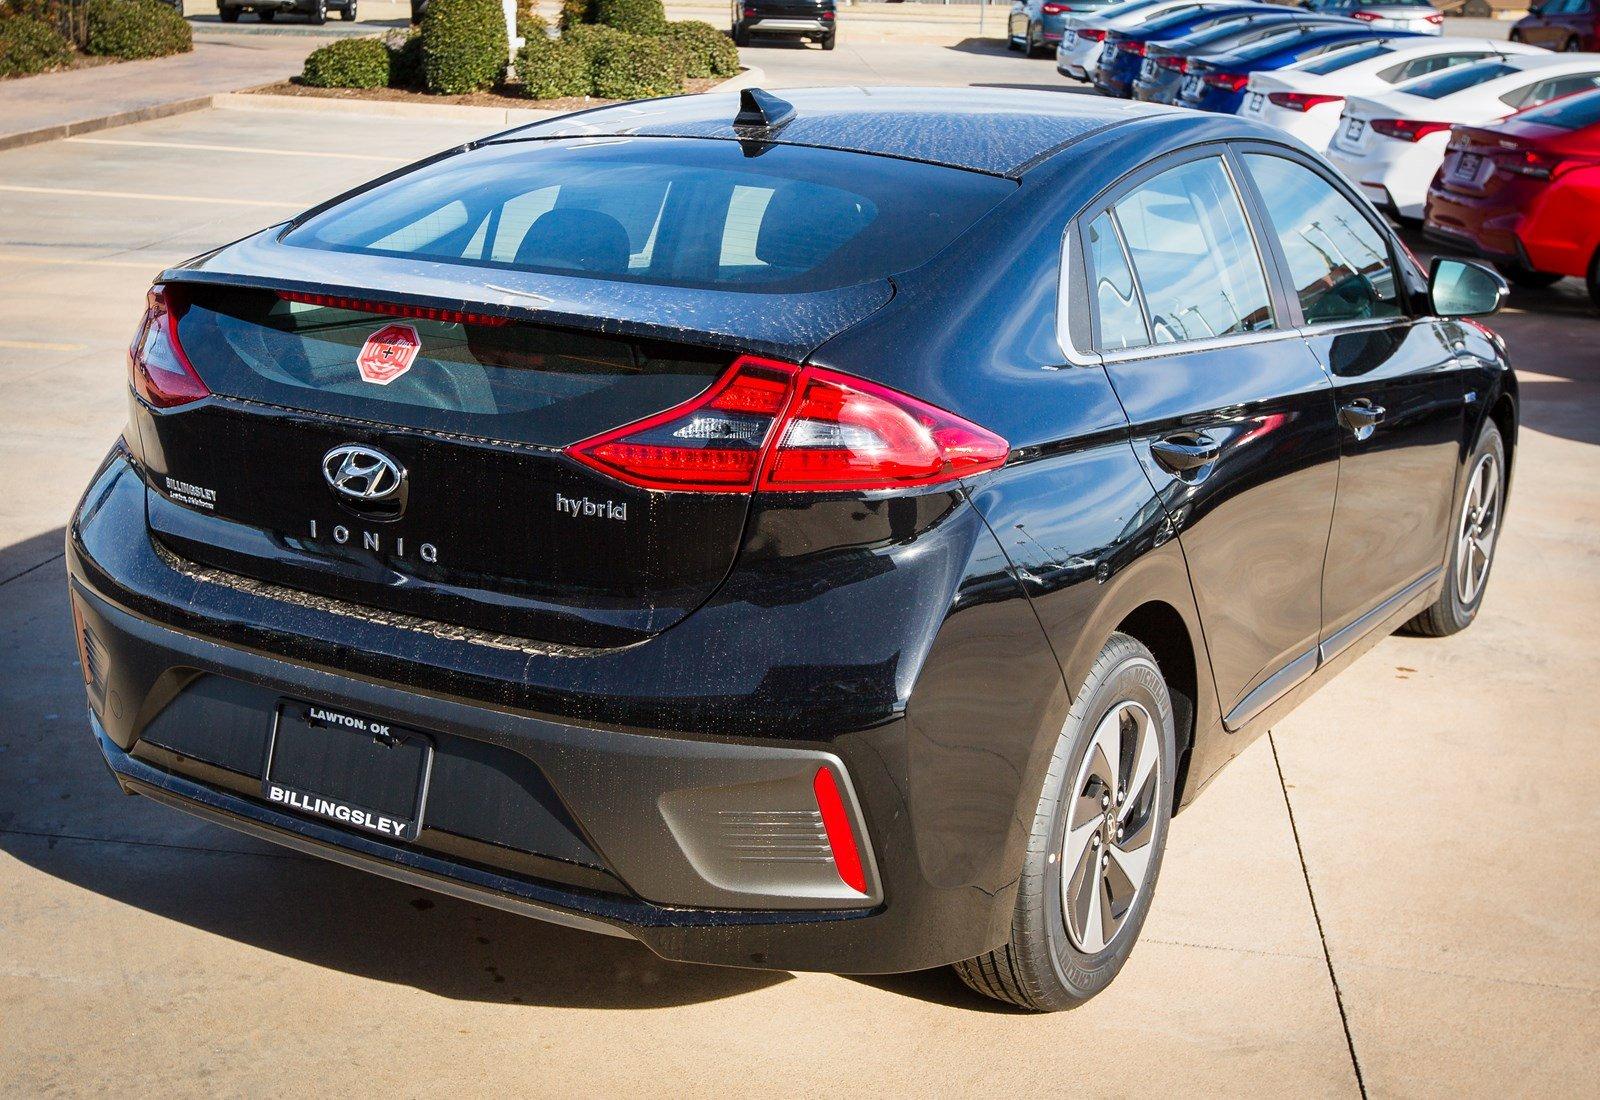 New 2019 Hyundai Ioniq Hybrid For Sale | Lawton OK VIN: KMHC75LC9KU134833